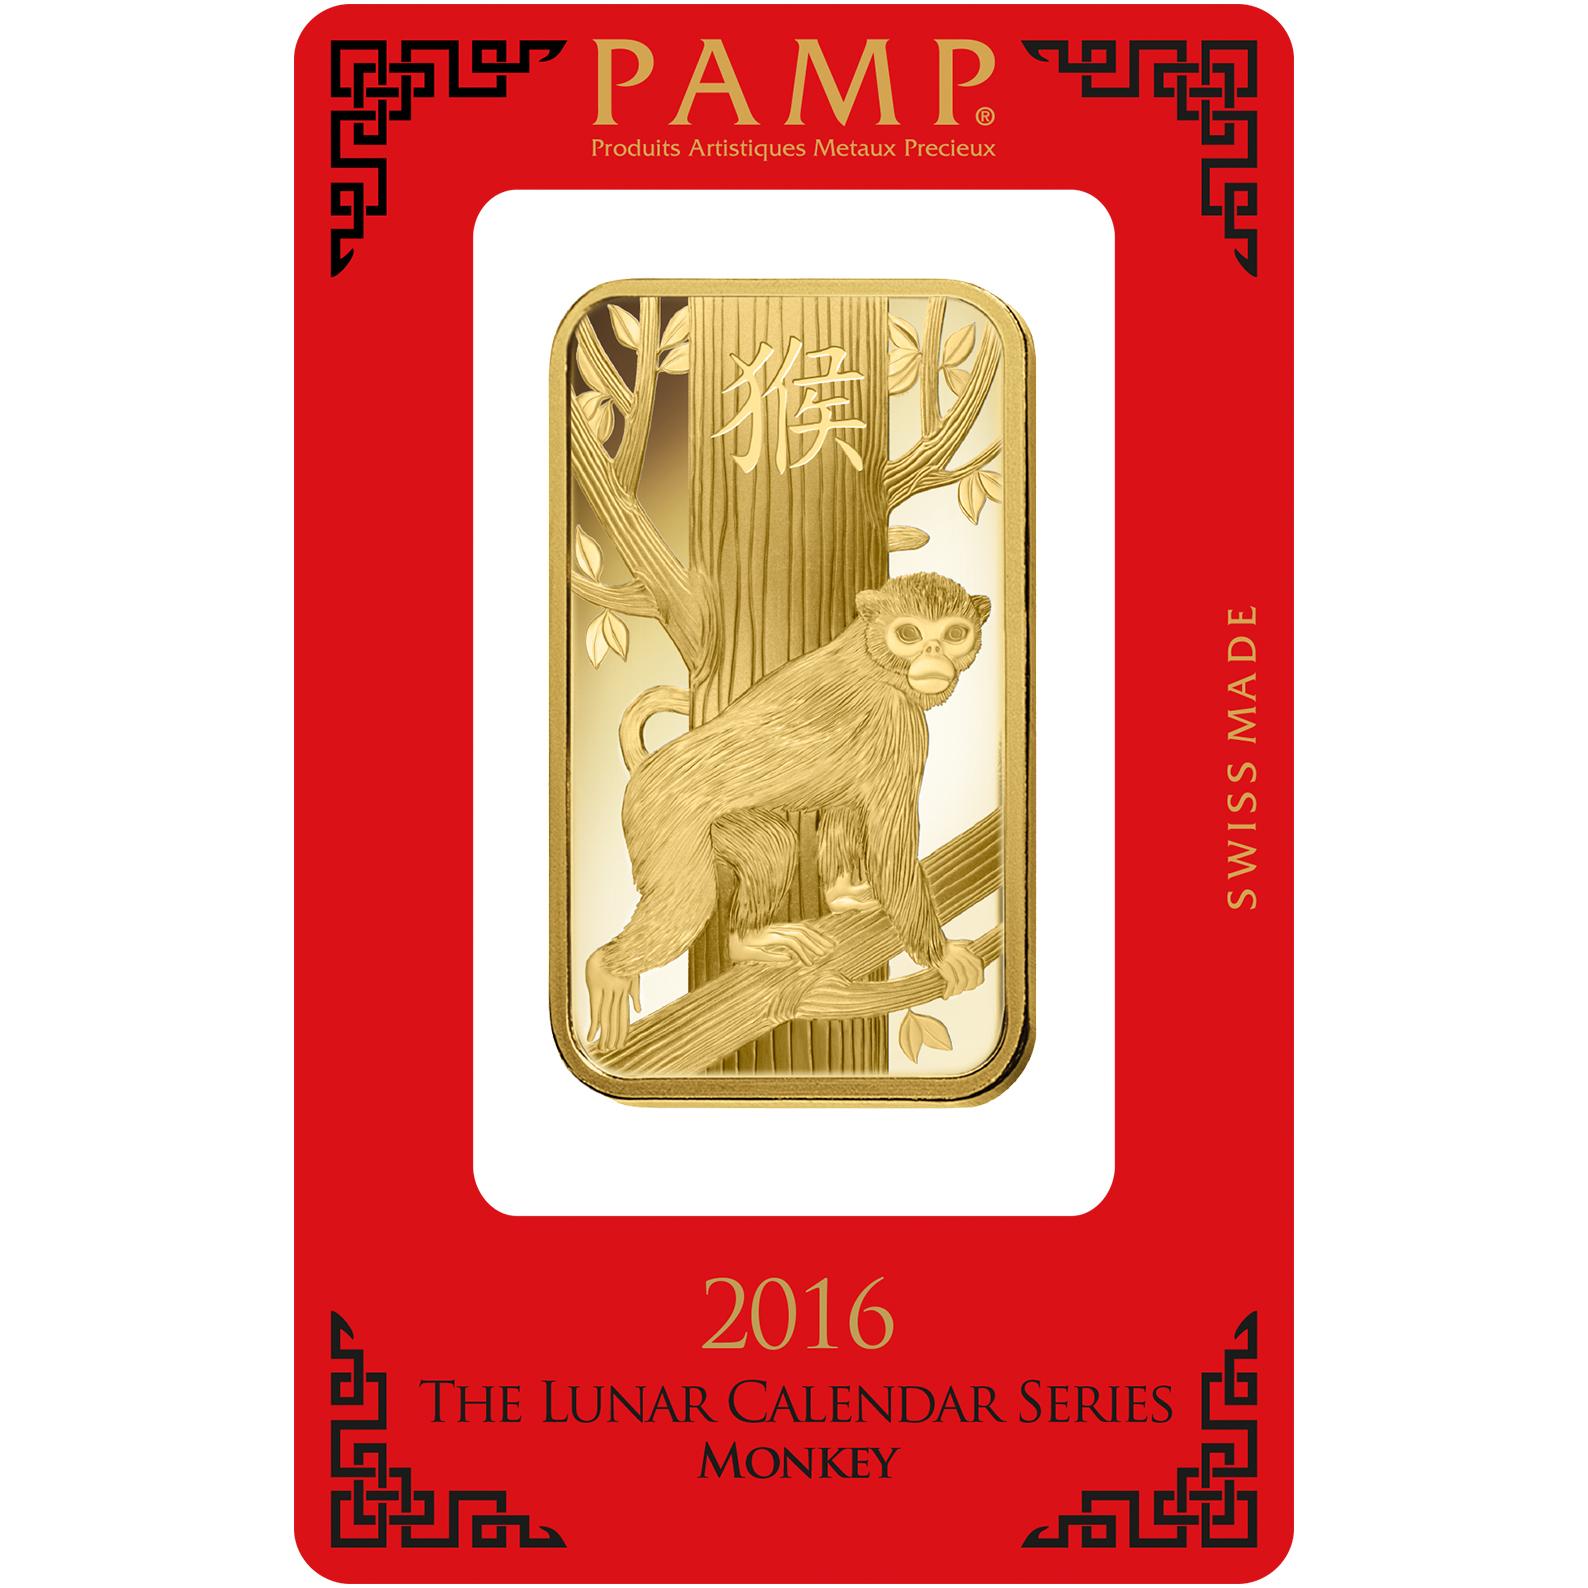 Lingotin d'or de 100 grammes - PAMP Suisse Lunar Singe